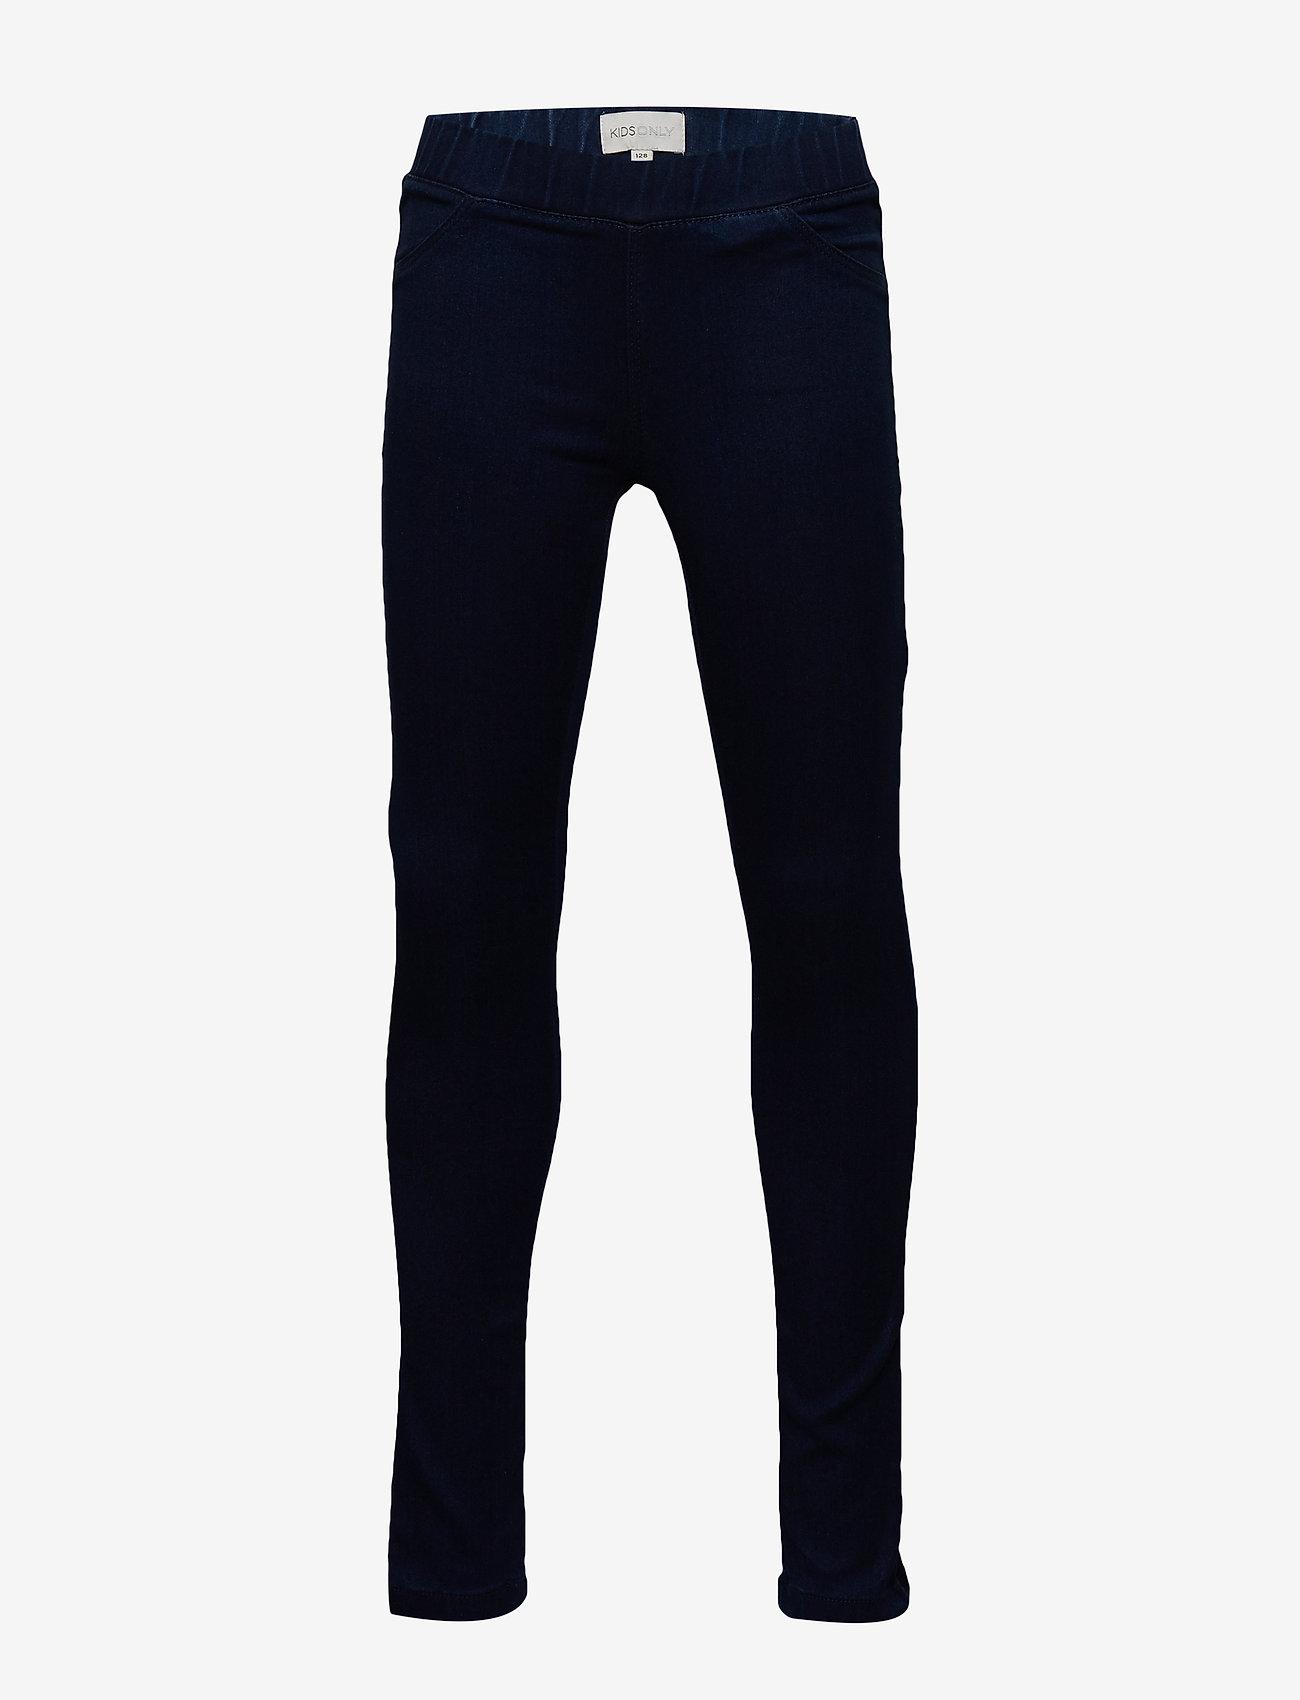 Kids Only - KONJUNE ROYAL DNM JEGGINGS 501 - jeans - dark blue denim - 0